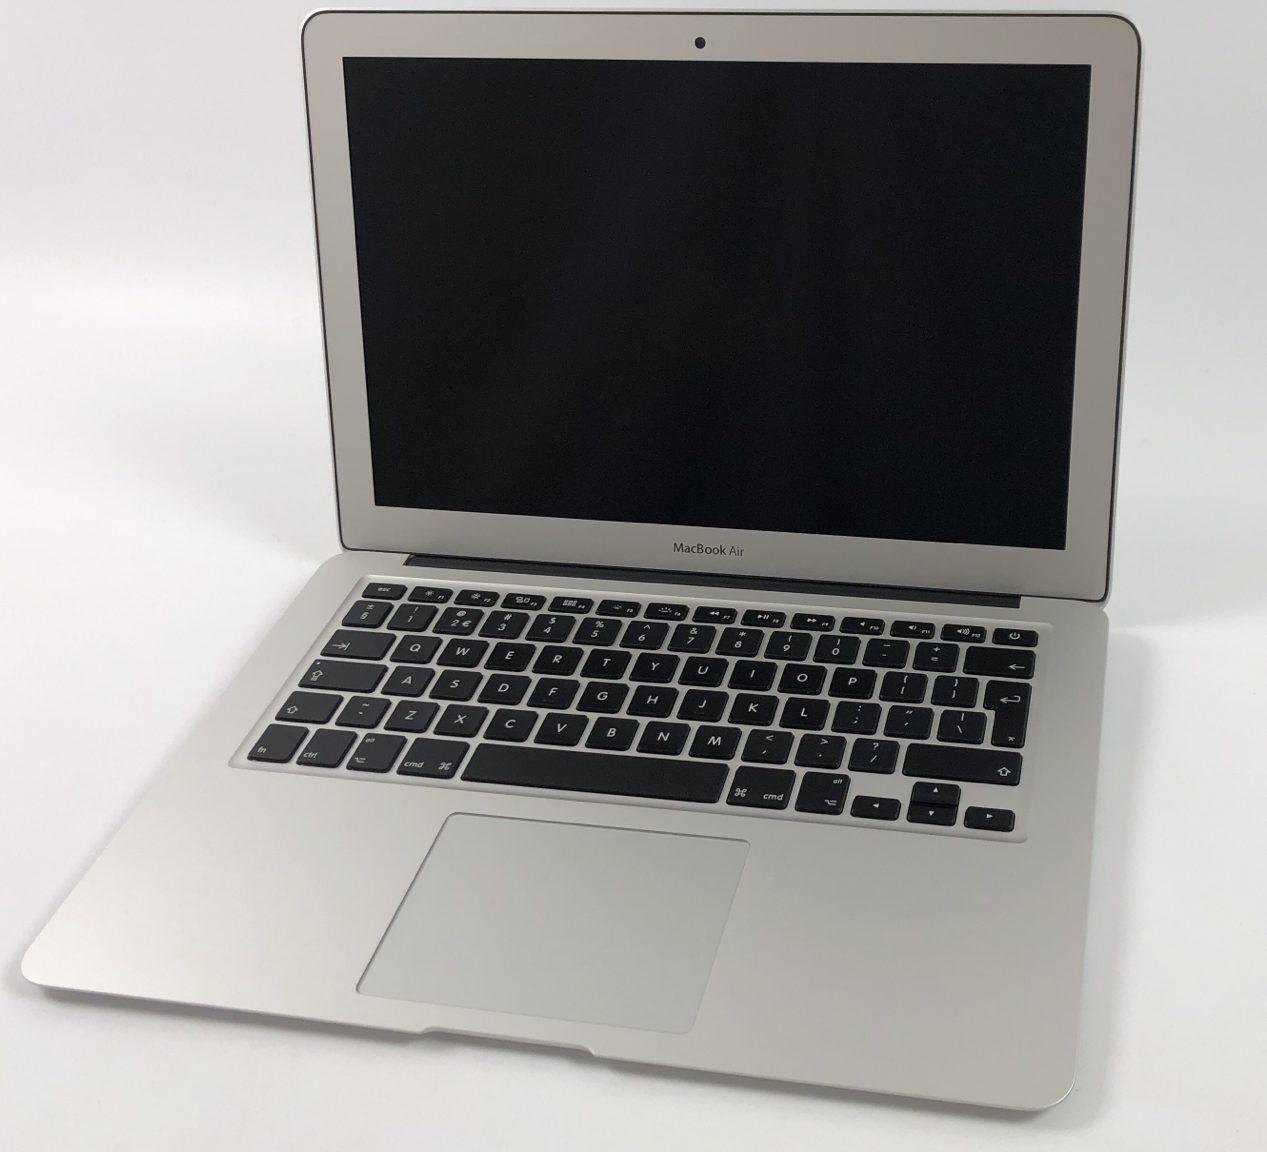 "MacBook Air 13"" Early 2015 (Intel Core i5 1.6 GHz 8 GB RAM 256 GB SSD), Intel Core i7 2.2 GHz, 8 GB RAM, 256 GB SSD, image 1"